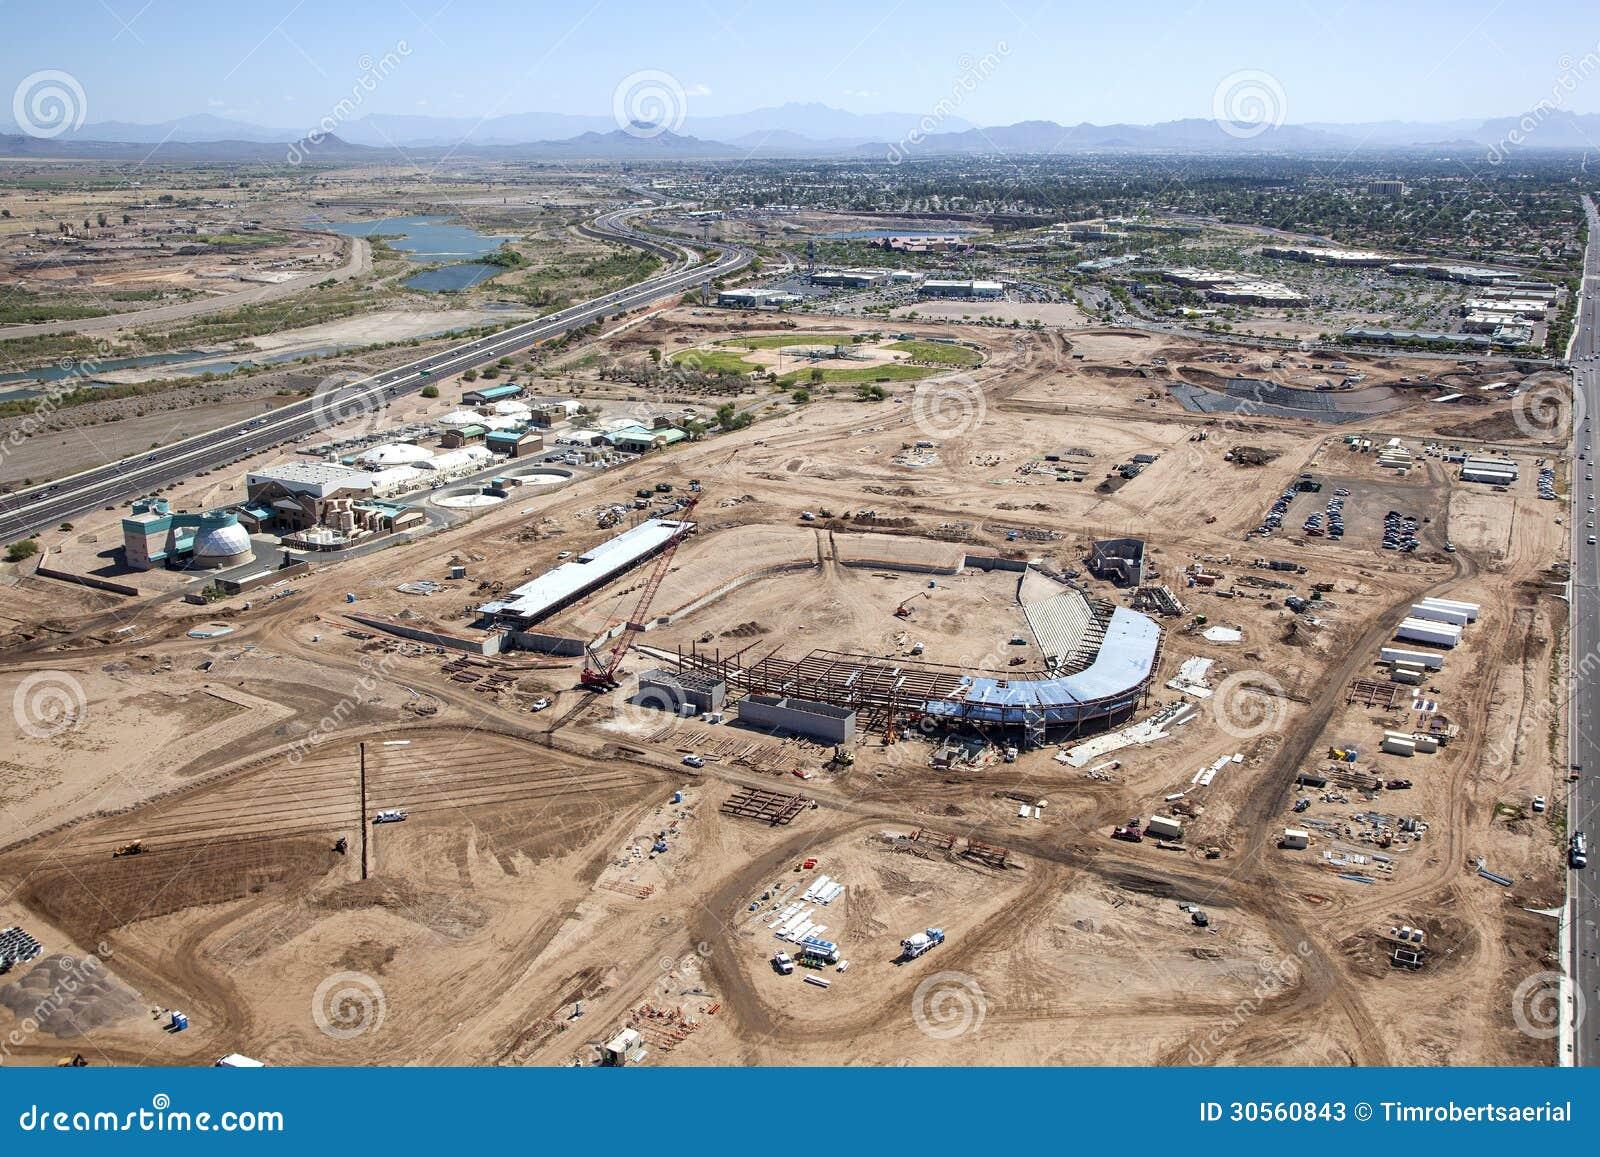 Stadium construction stock photos image 30560843 for Pond plants mesa az